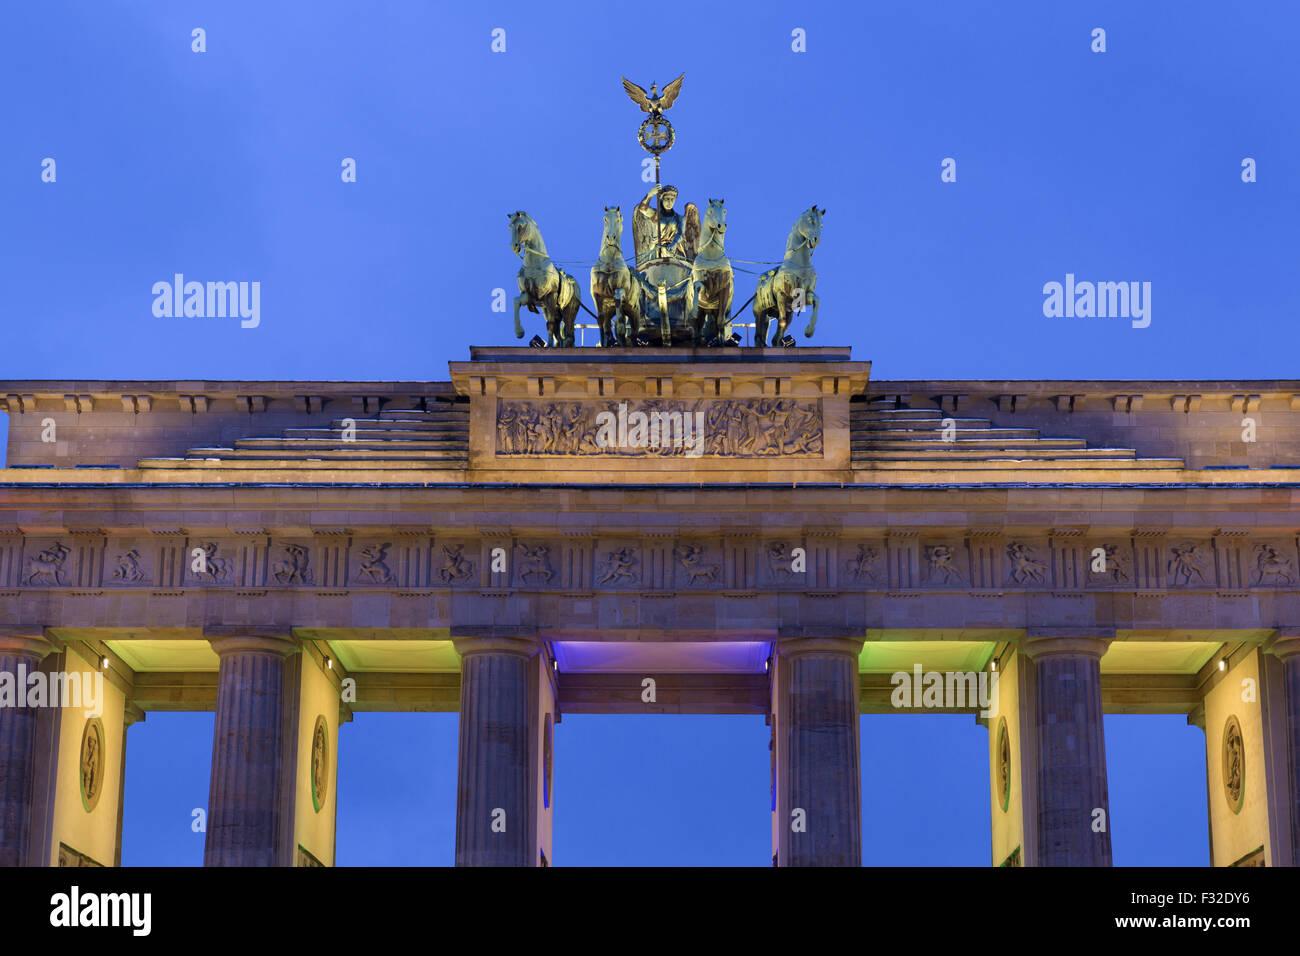 Quadriga on 18th century neoclassical triumphal arch at night, Brandenburg Gate, Berlin, Germany, January - Stock Image